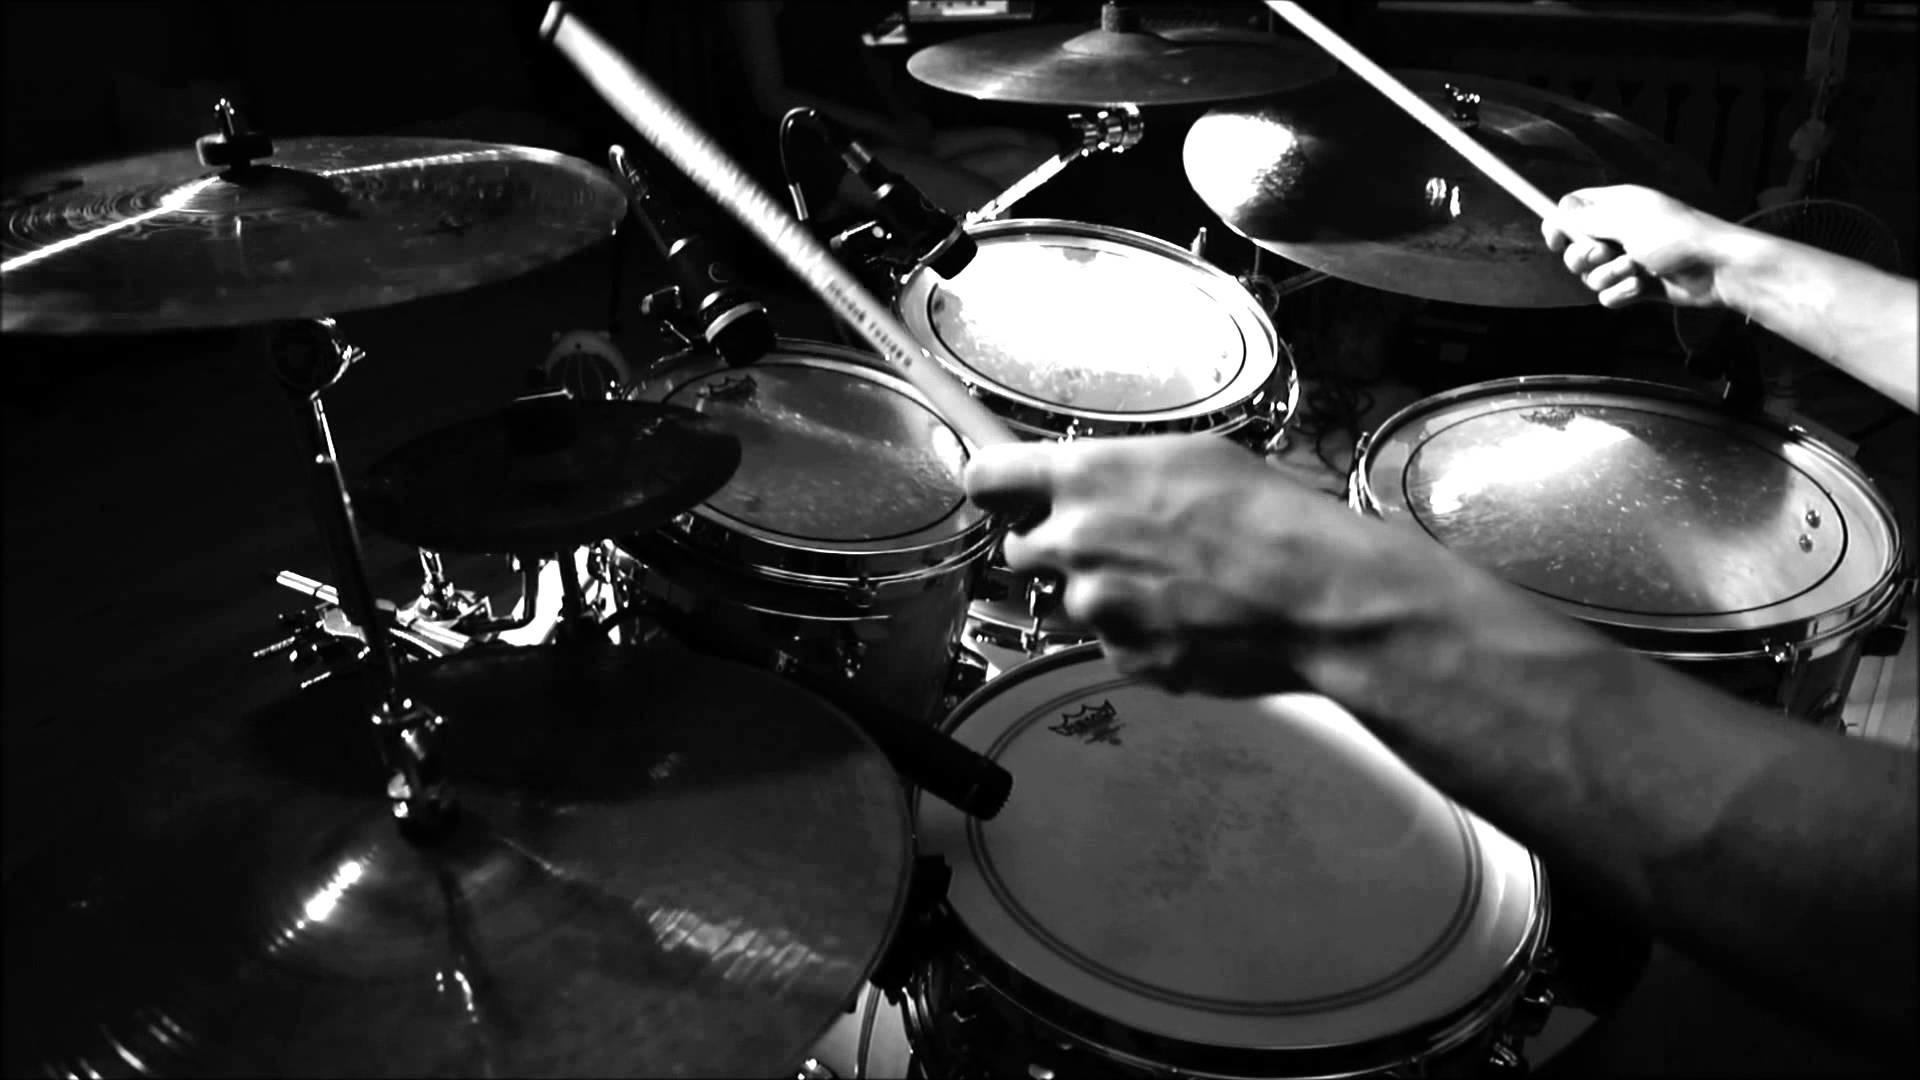 pearl drums wallpaper 183��